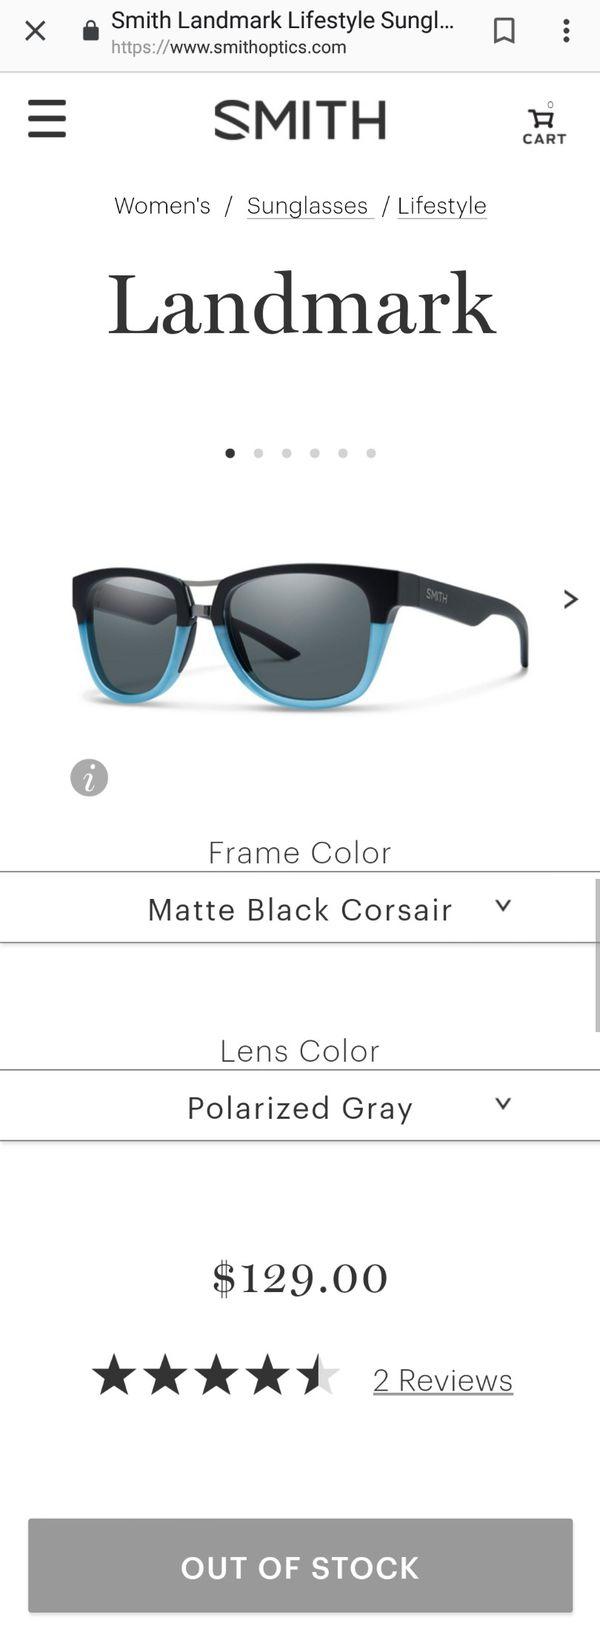 88728fad03 Smith Landmark Sunglasses for Sale in Los Angeles